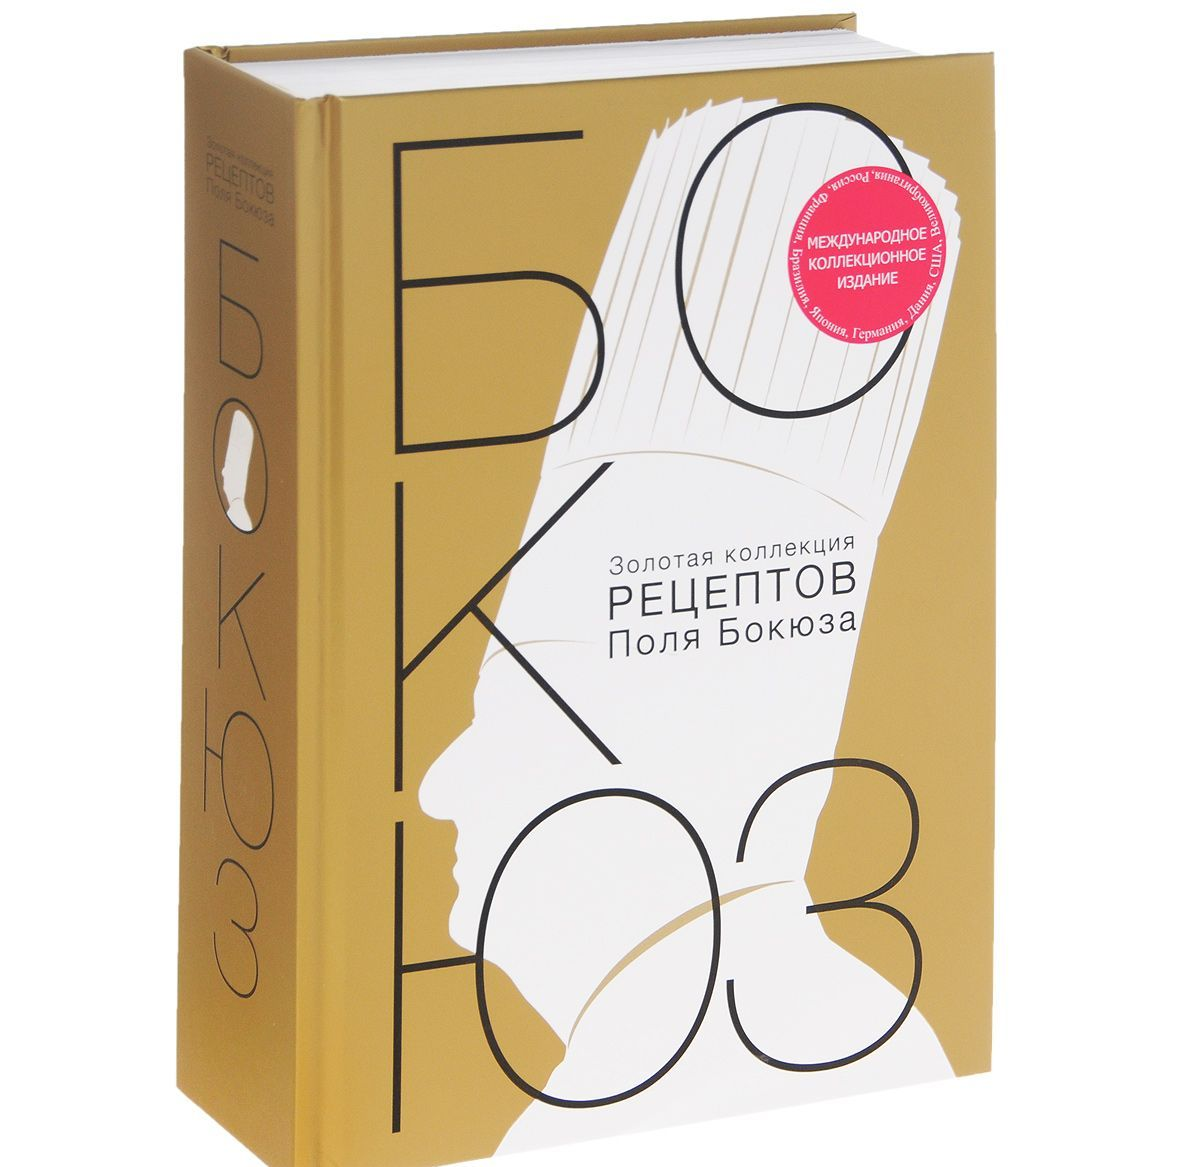 Онлайн каталог PROMENU: Книга «Золотая коллекция рецептов Поля Бокюза» Books Books BK02